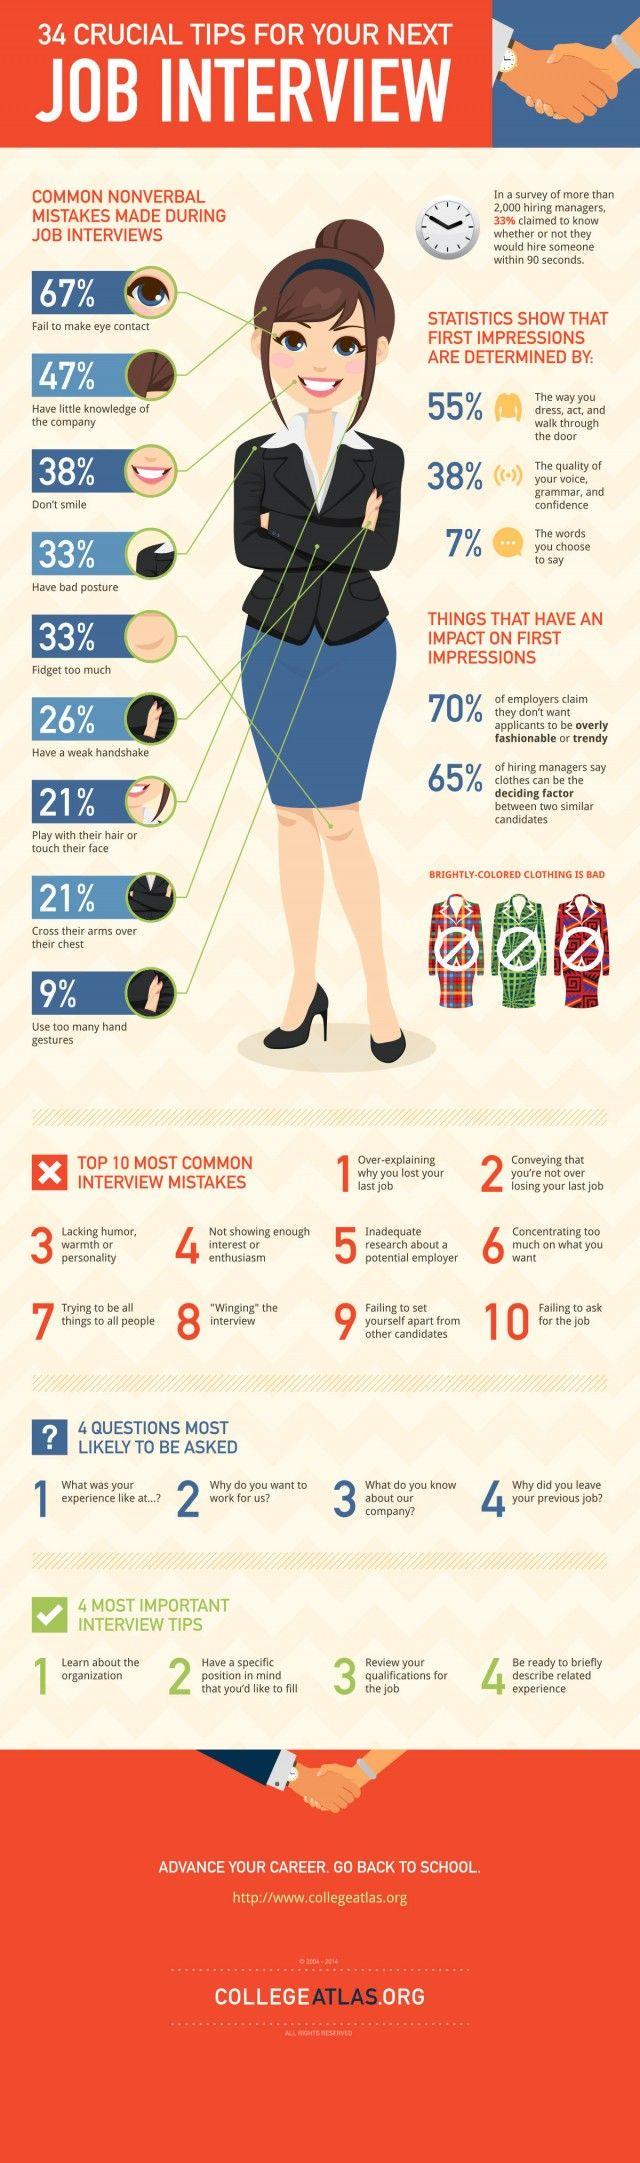 25+ best ideas about Hr interview questions on Pinterest | Job ...